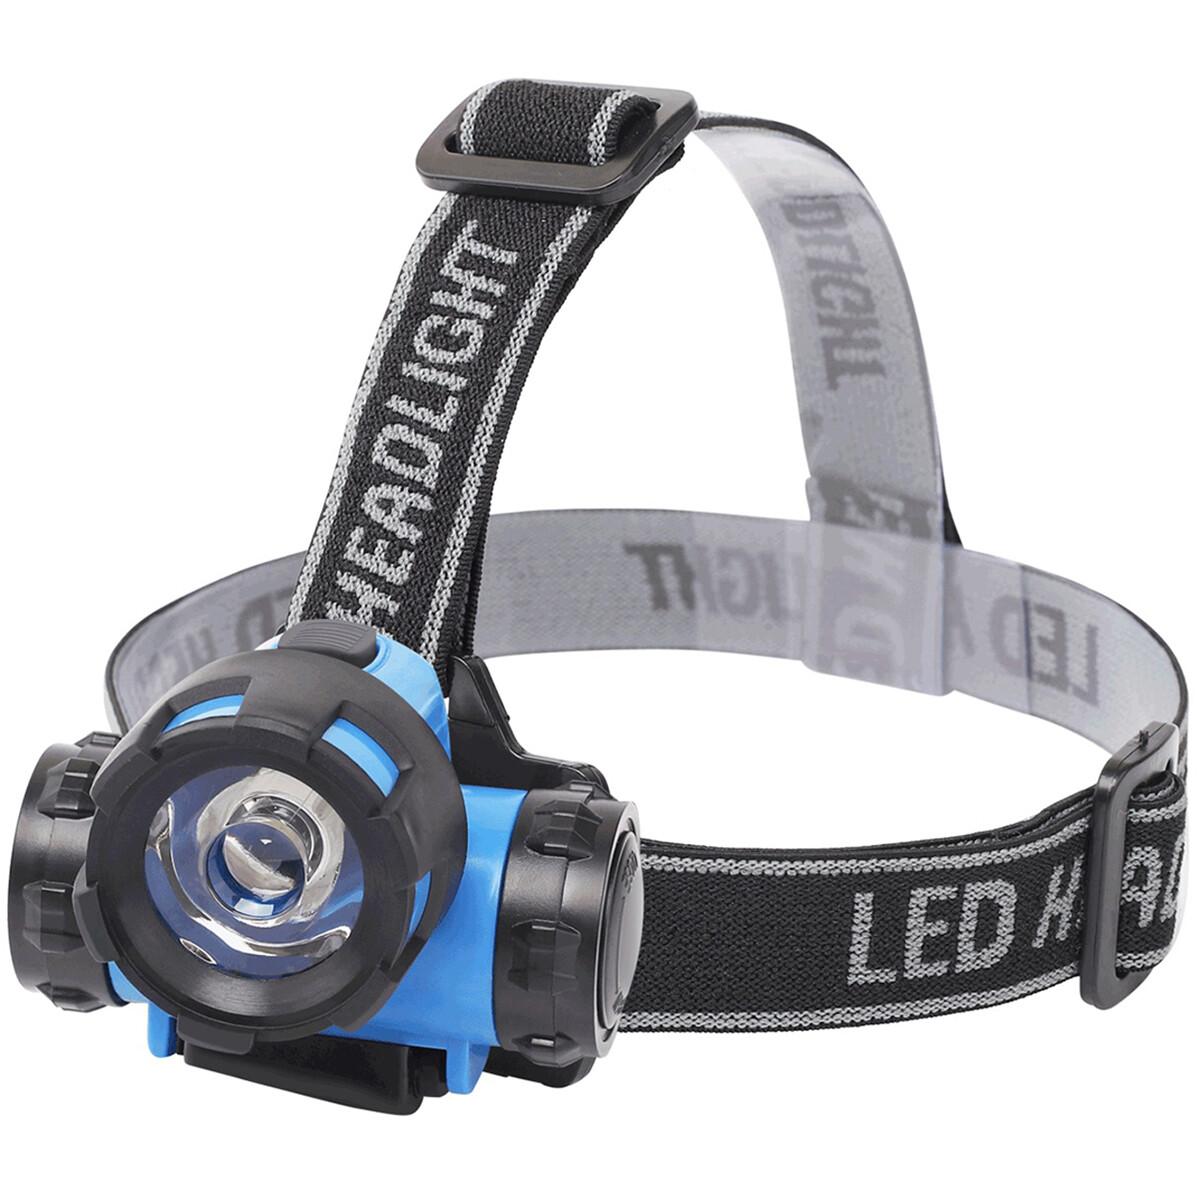 LED Hoofdlamp - Aigi Crunli - Waterdicht - 50 Meter - Kantelbaar - 1 LED - 0.8W - Blauw | Vervangt 7